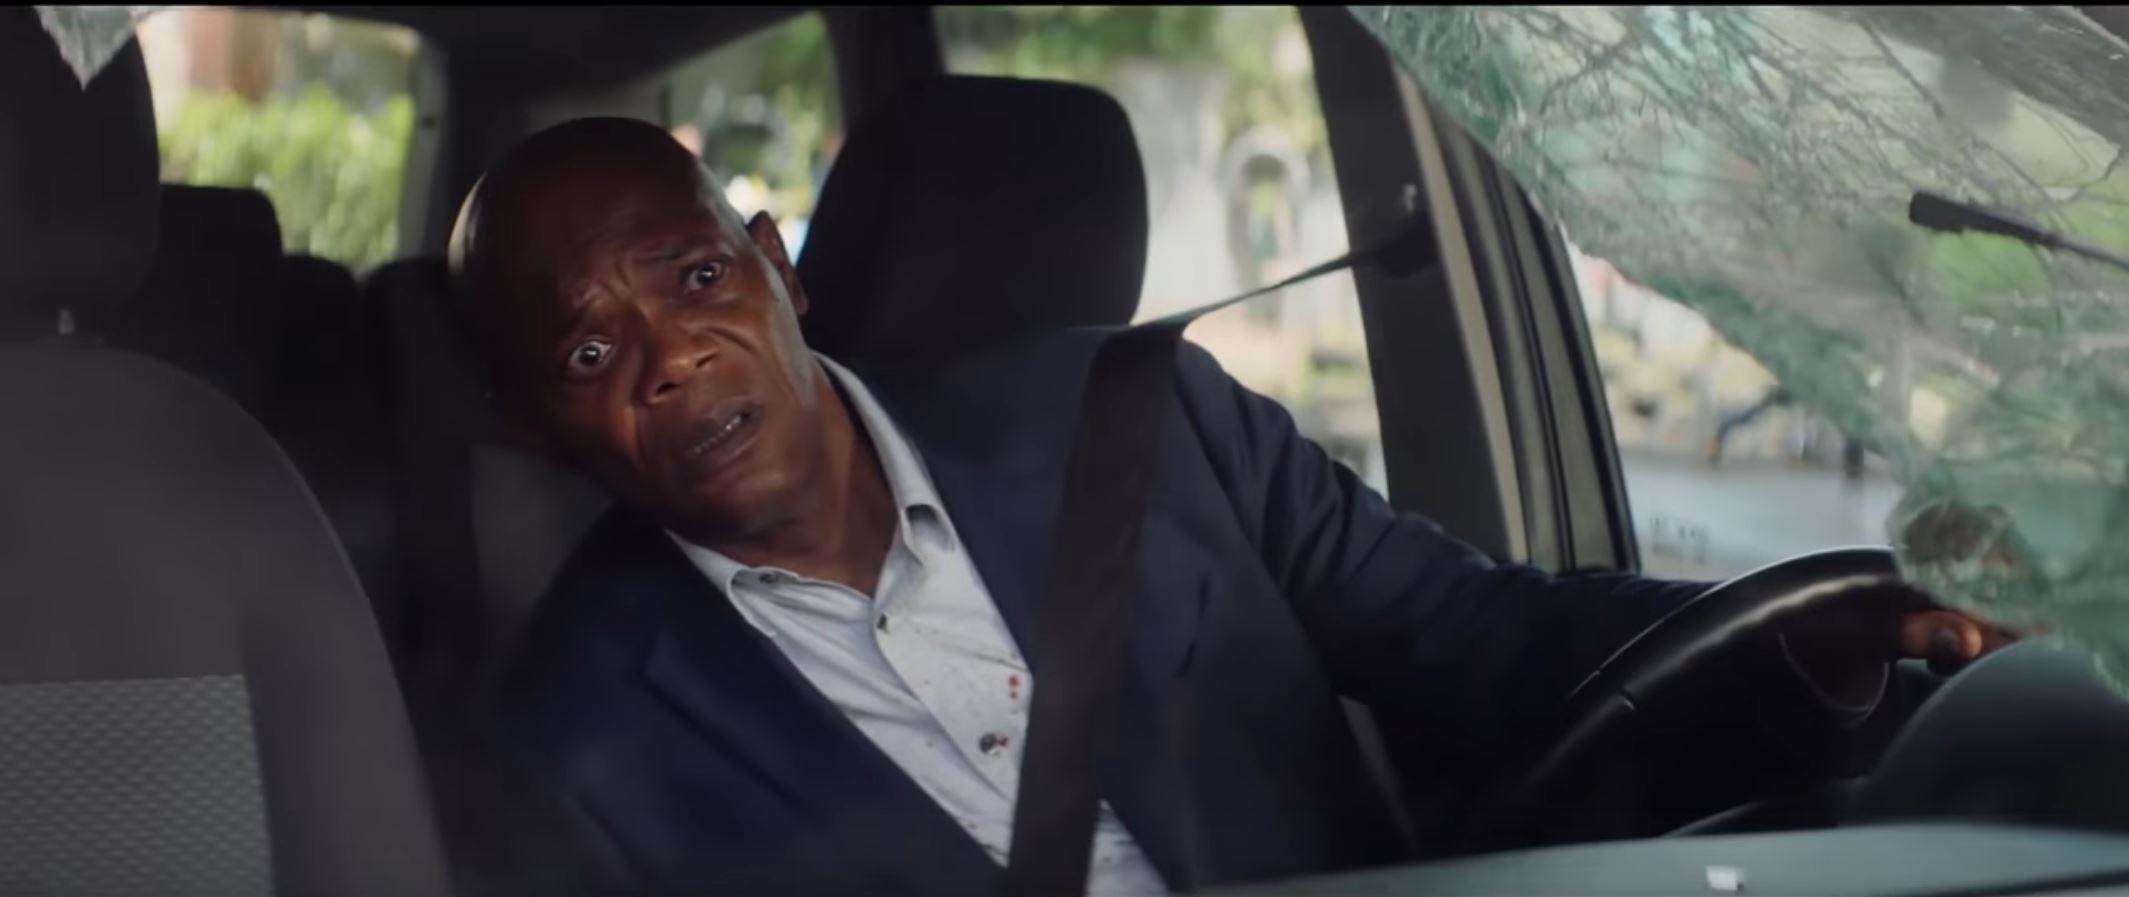 The Hіtmаn's Bоdyguаrd Trailer feat. Ryan Reynolds & Samuel L. Jackson